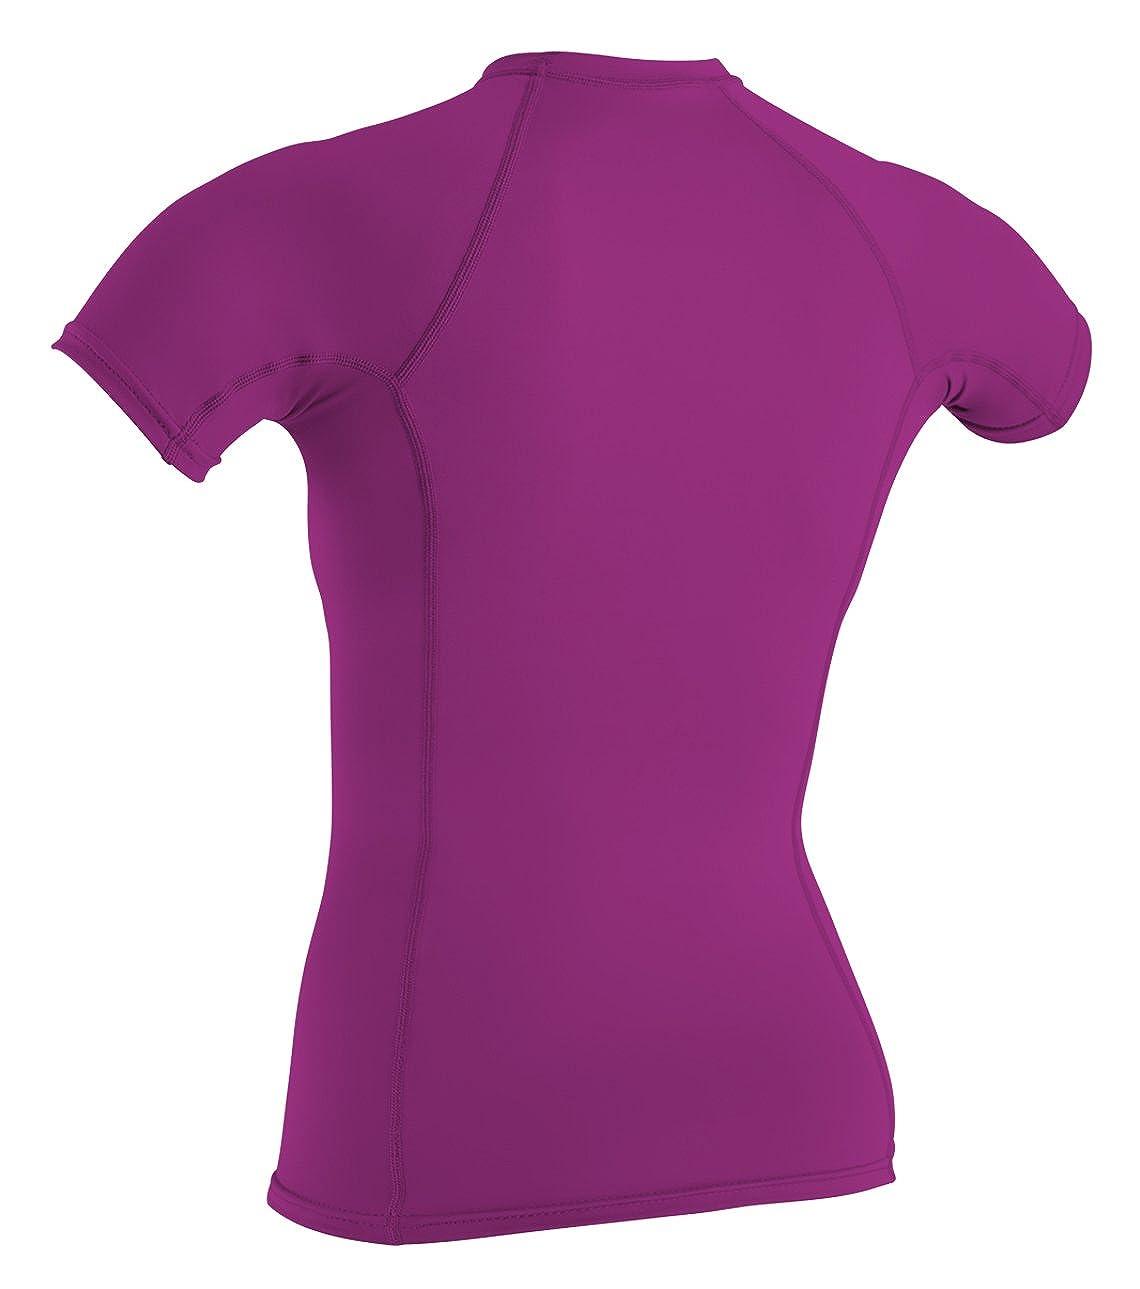 Manga Corta ONEILL WETSUITS ONeill Camiseta de Neopreno para Mujer con protecci/ón UV Cuello Redondo